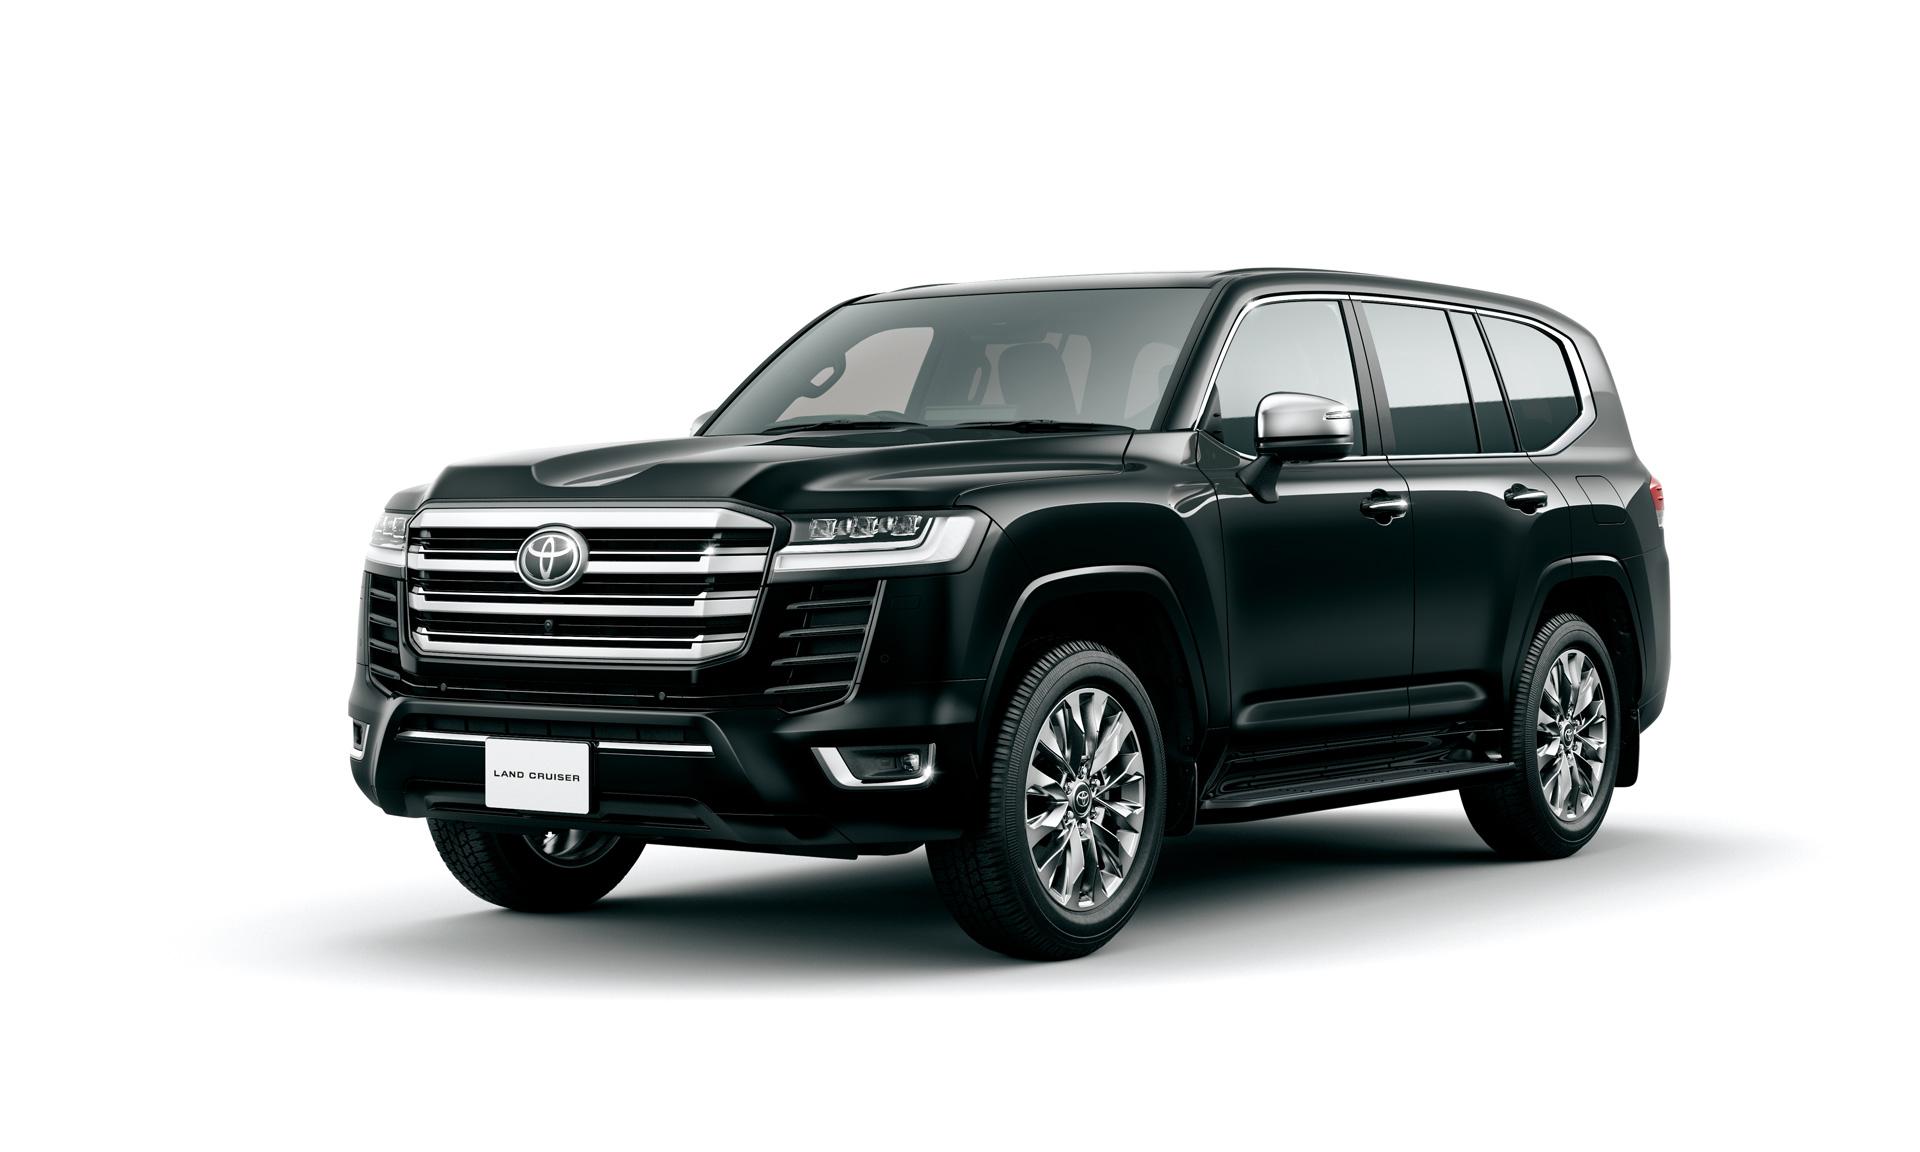 Toyota Launches New Land Cruiser - Image 8